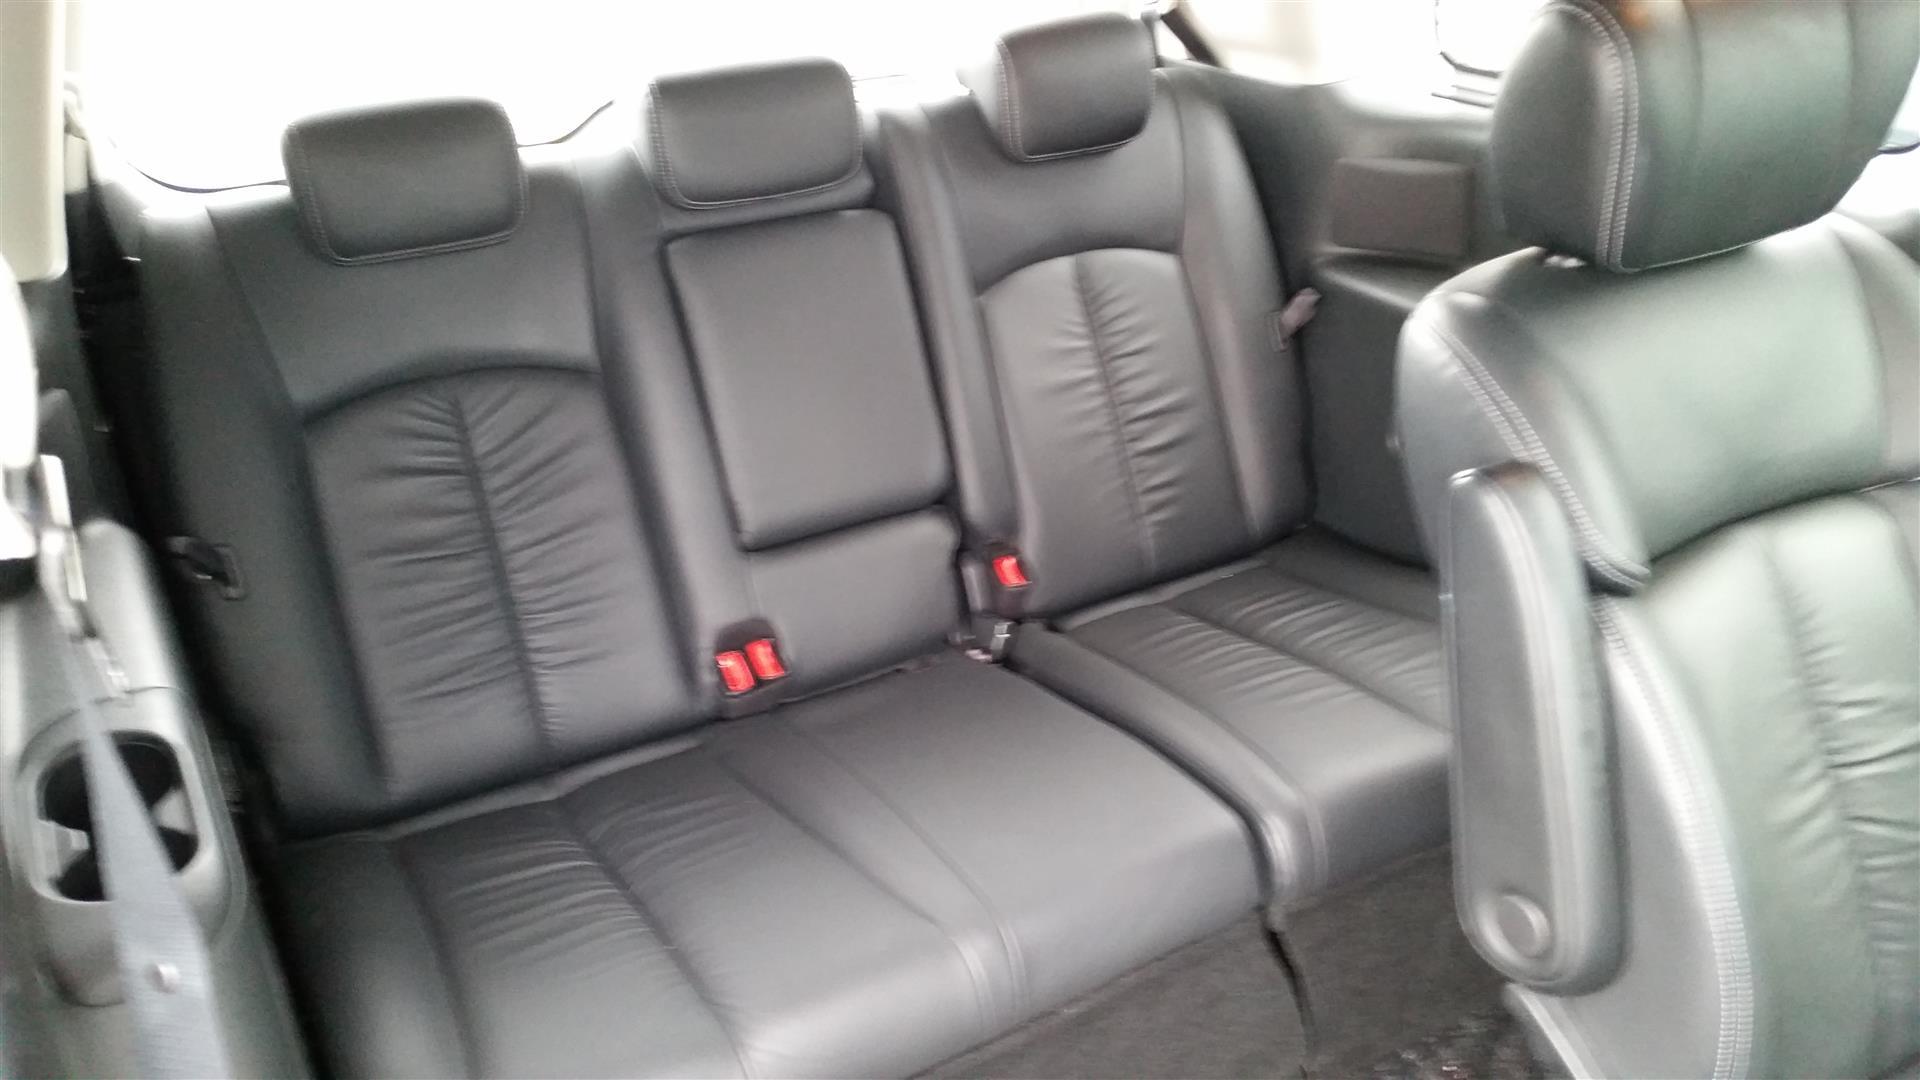 2012 Nissan Elgrand E52 20150627_143644 (Large)